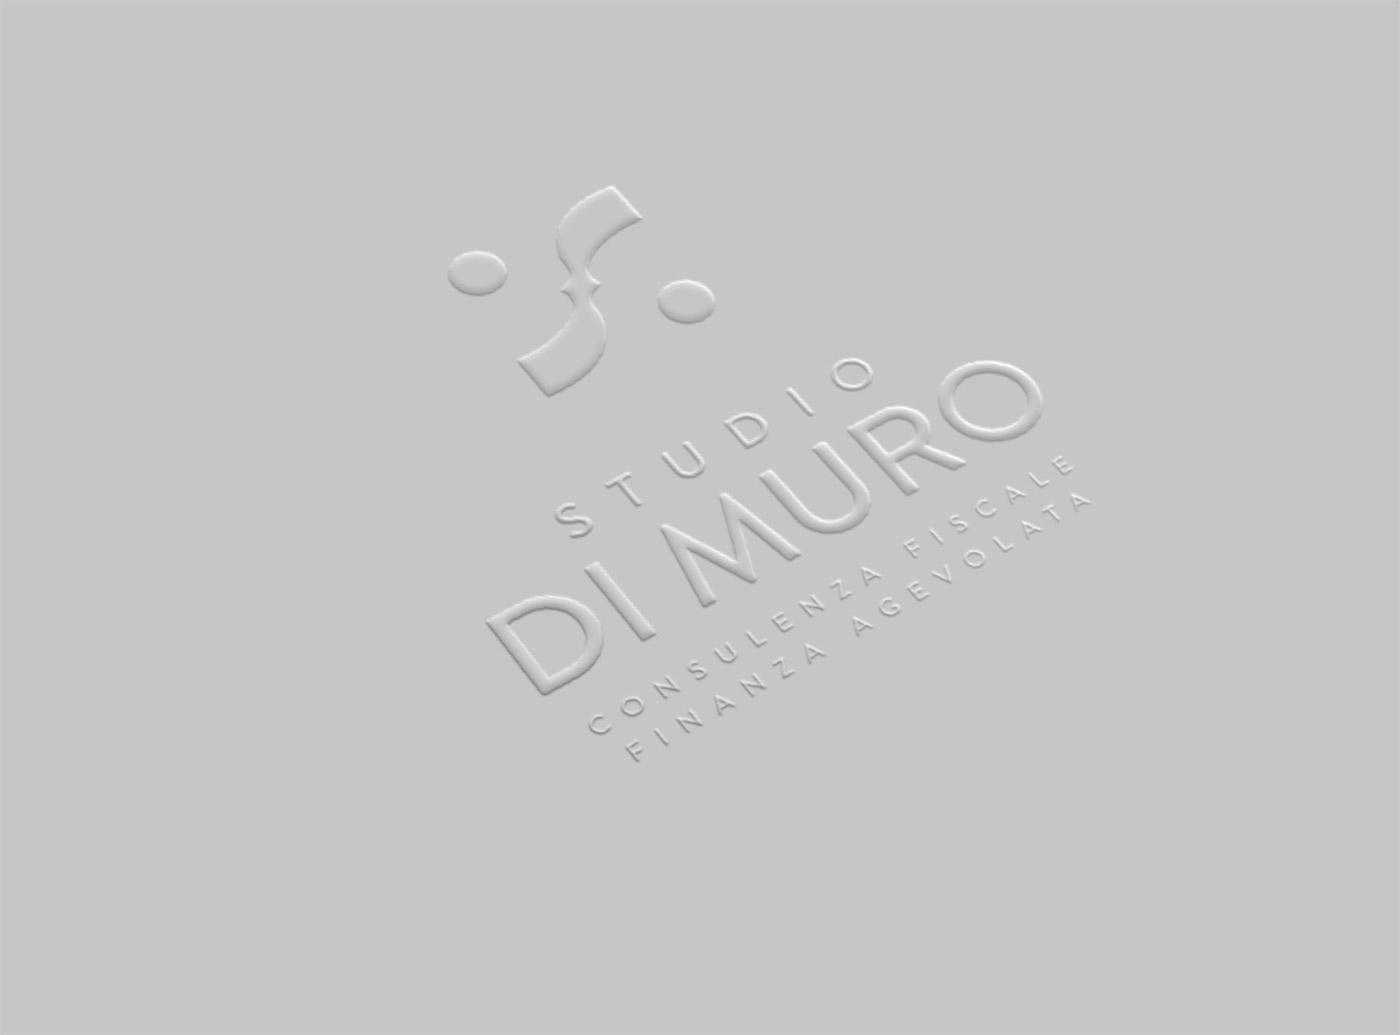 studio di muro ego55 branding